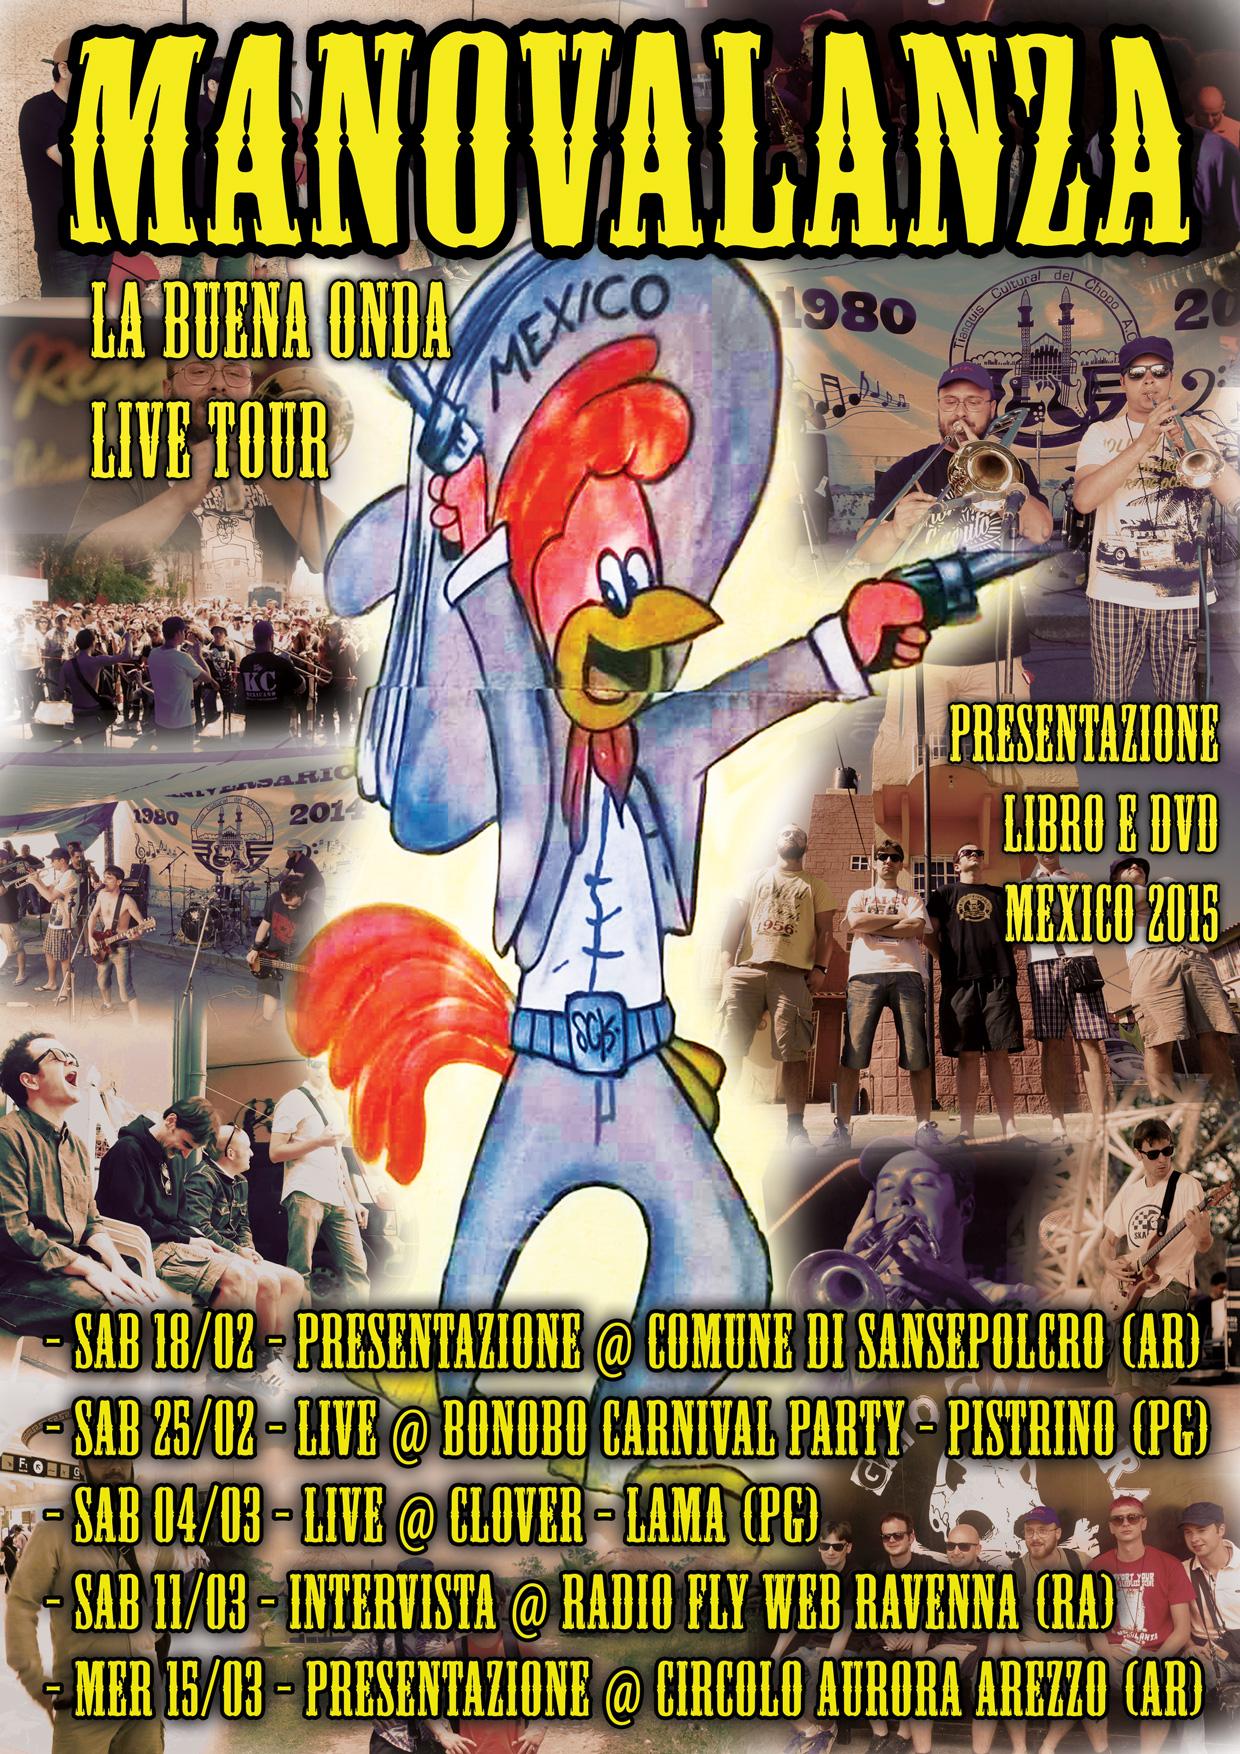 La buena onda live tour